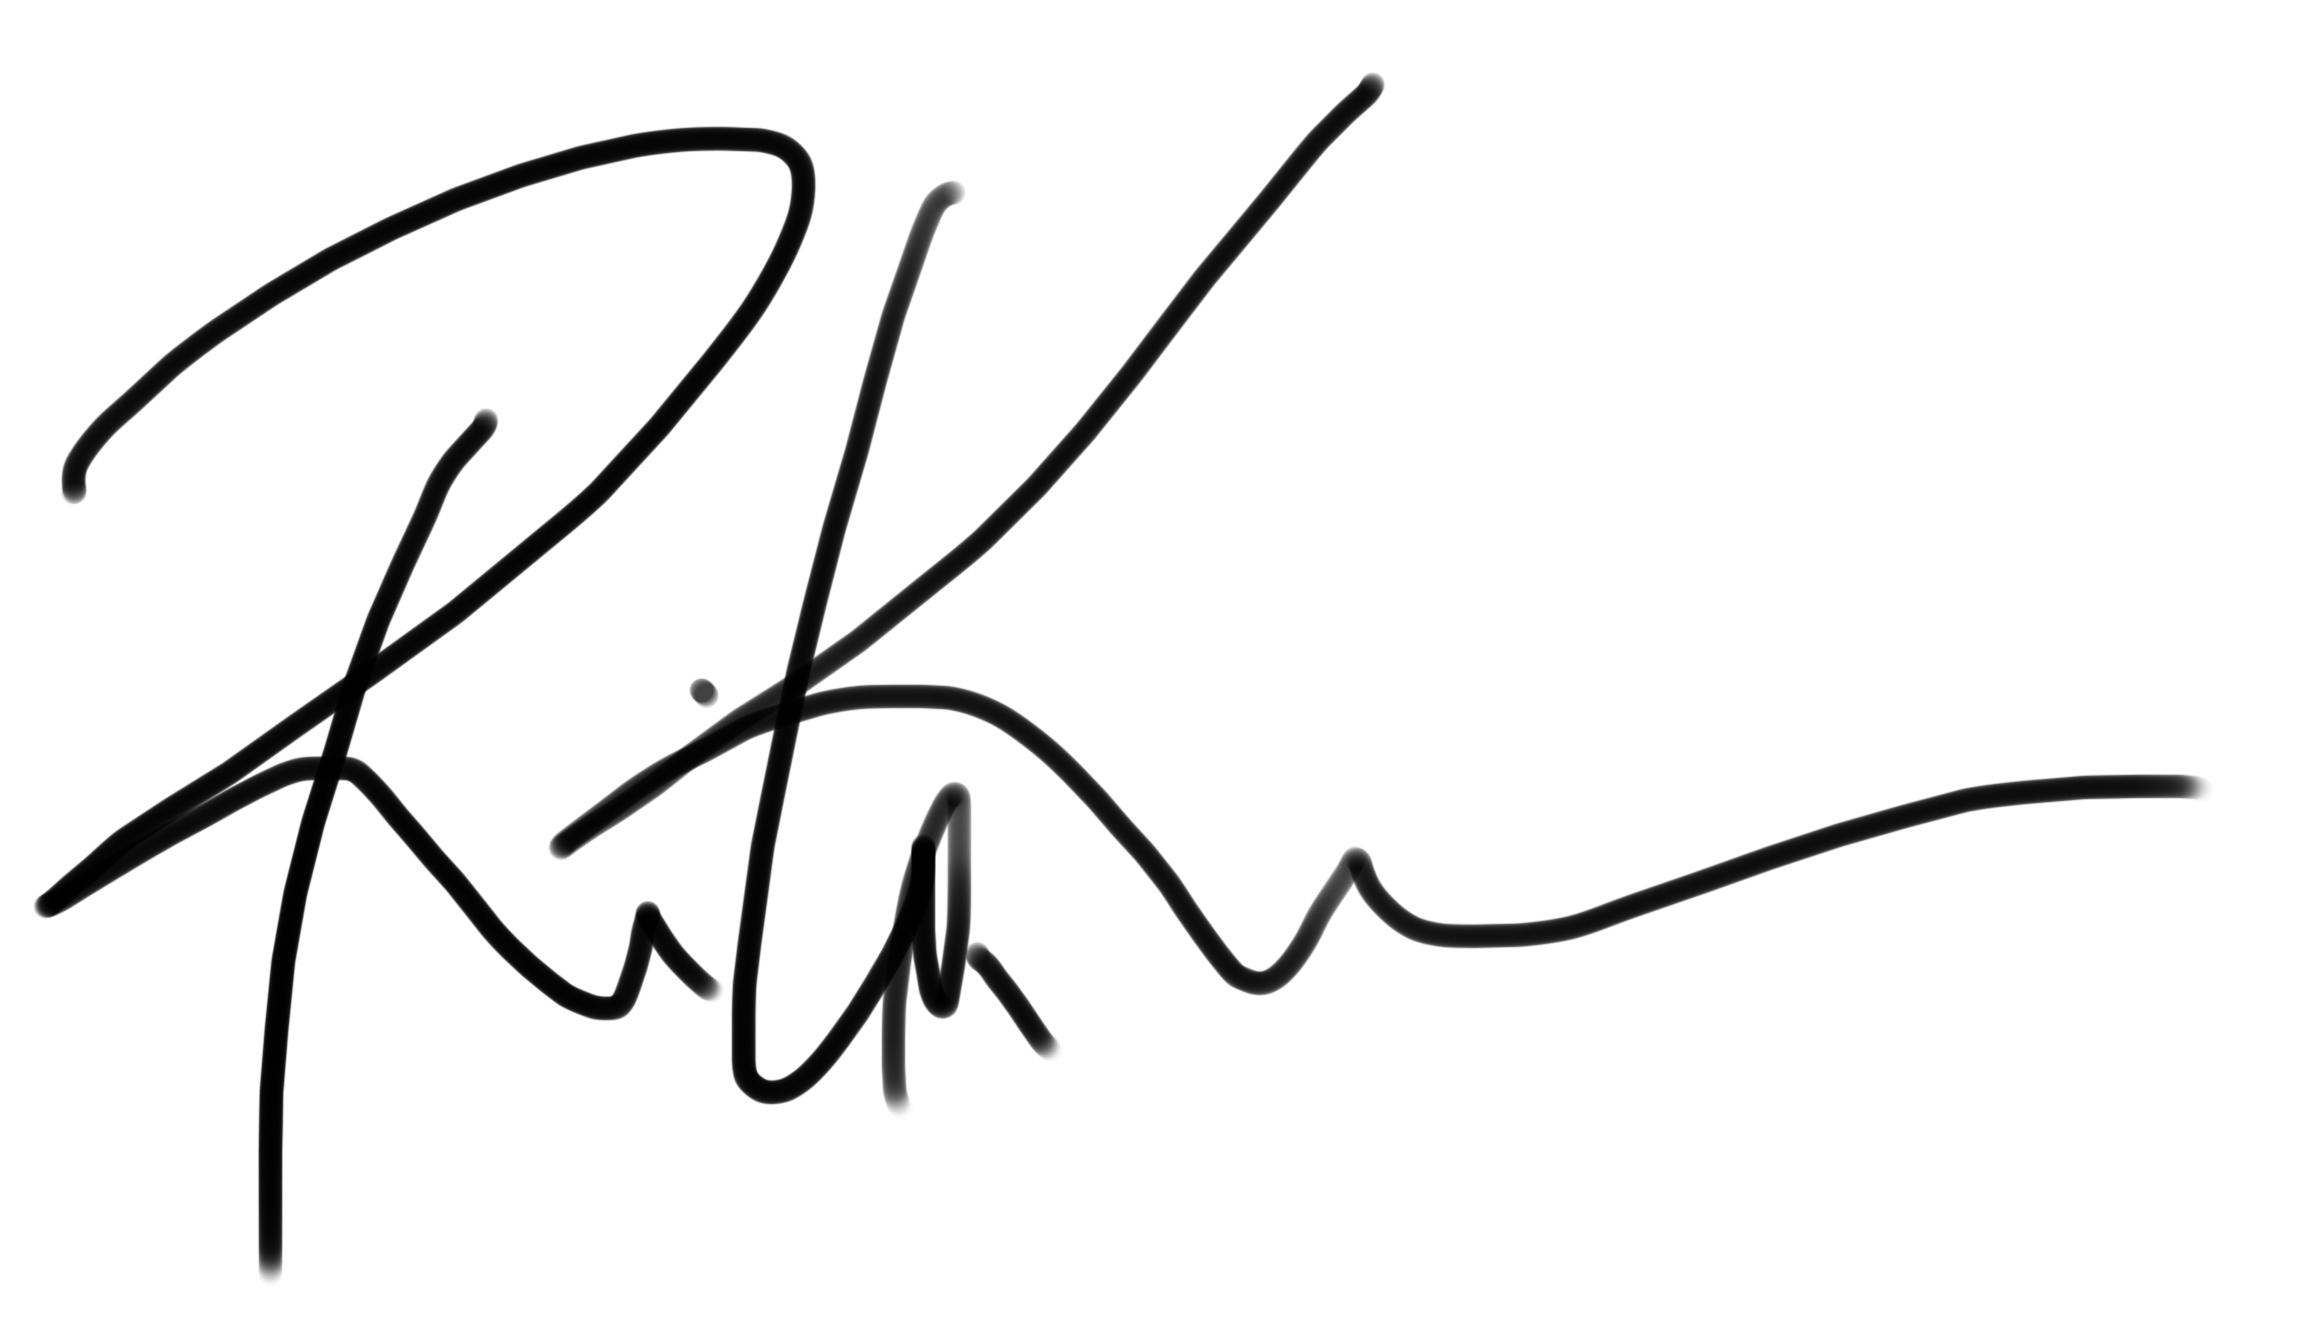 rita karam Signature